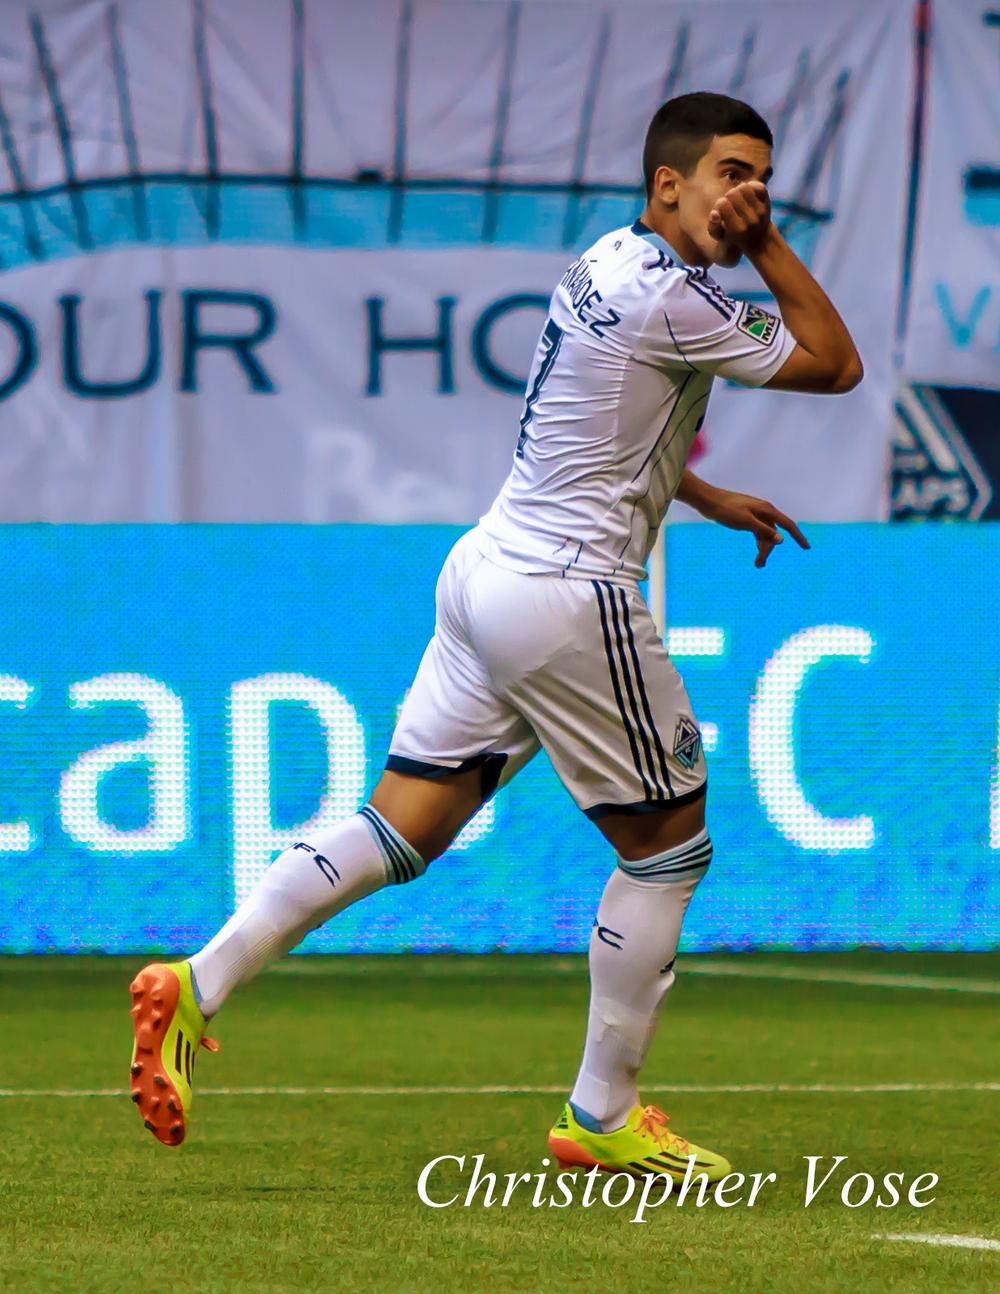 2014-10-04 Sebastián Fernández's First Goal Celebration 1.jpg